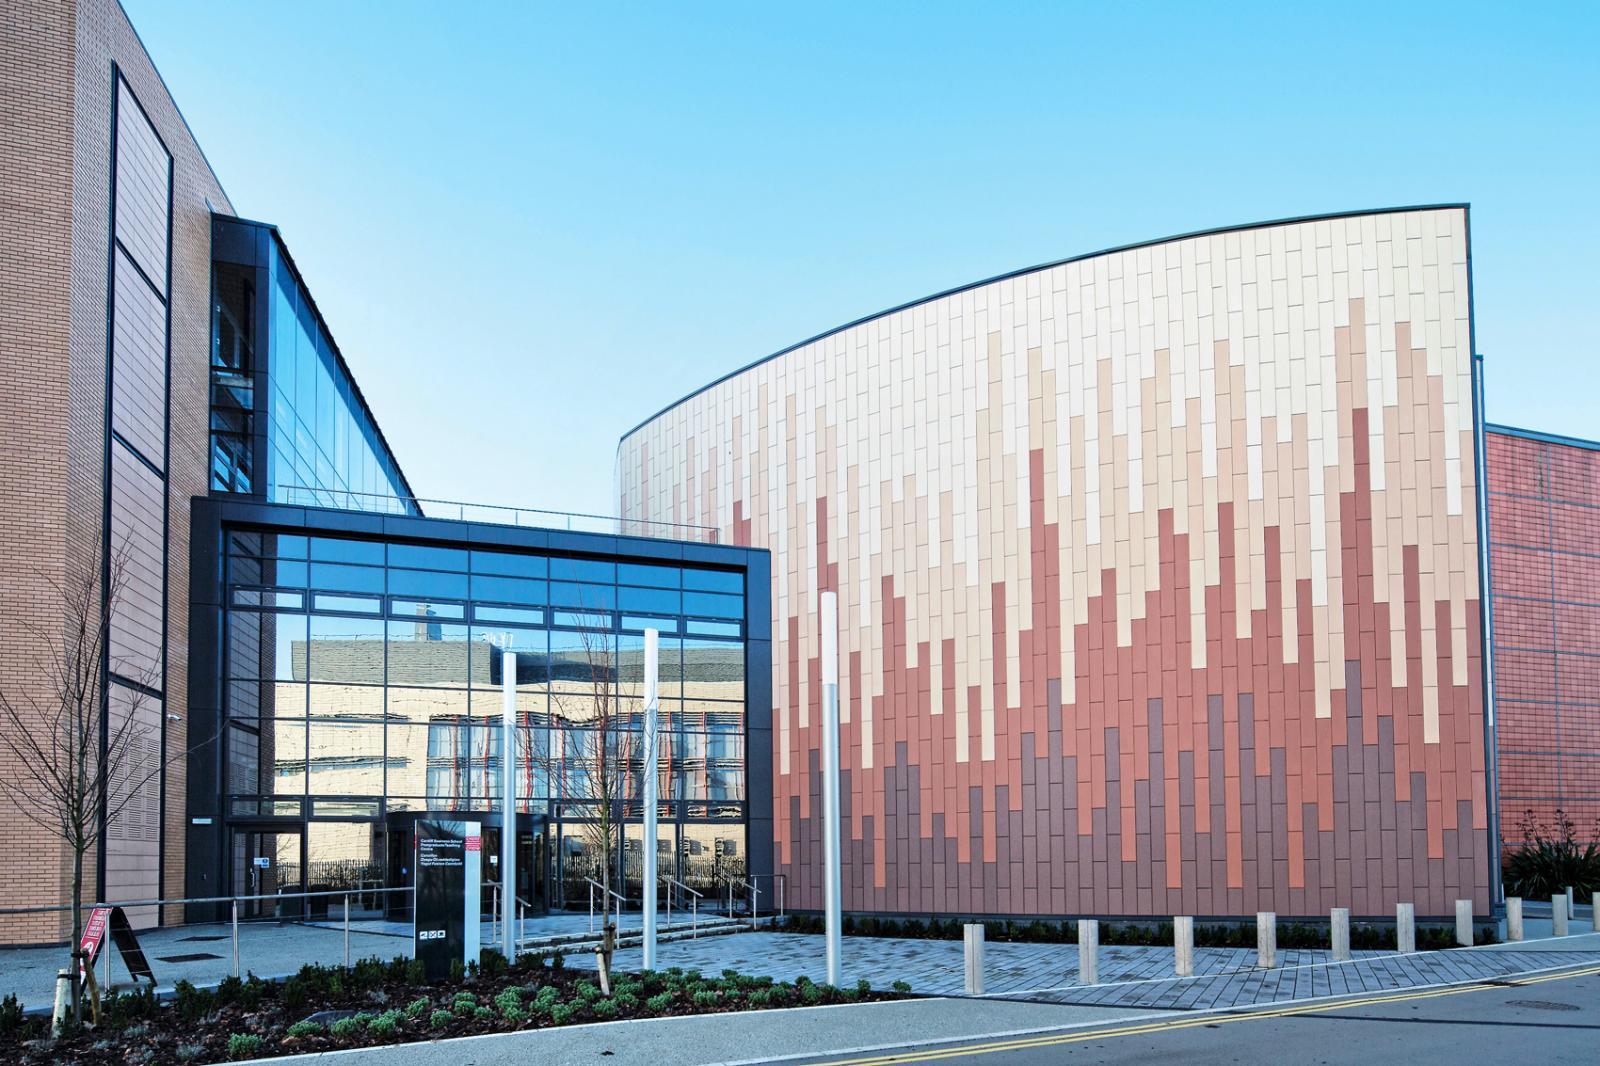 Cardiff Business School Main